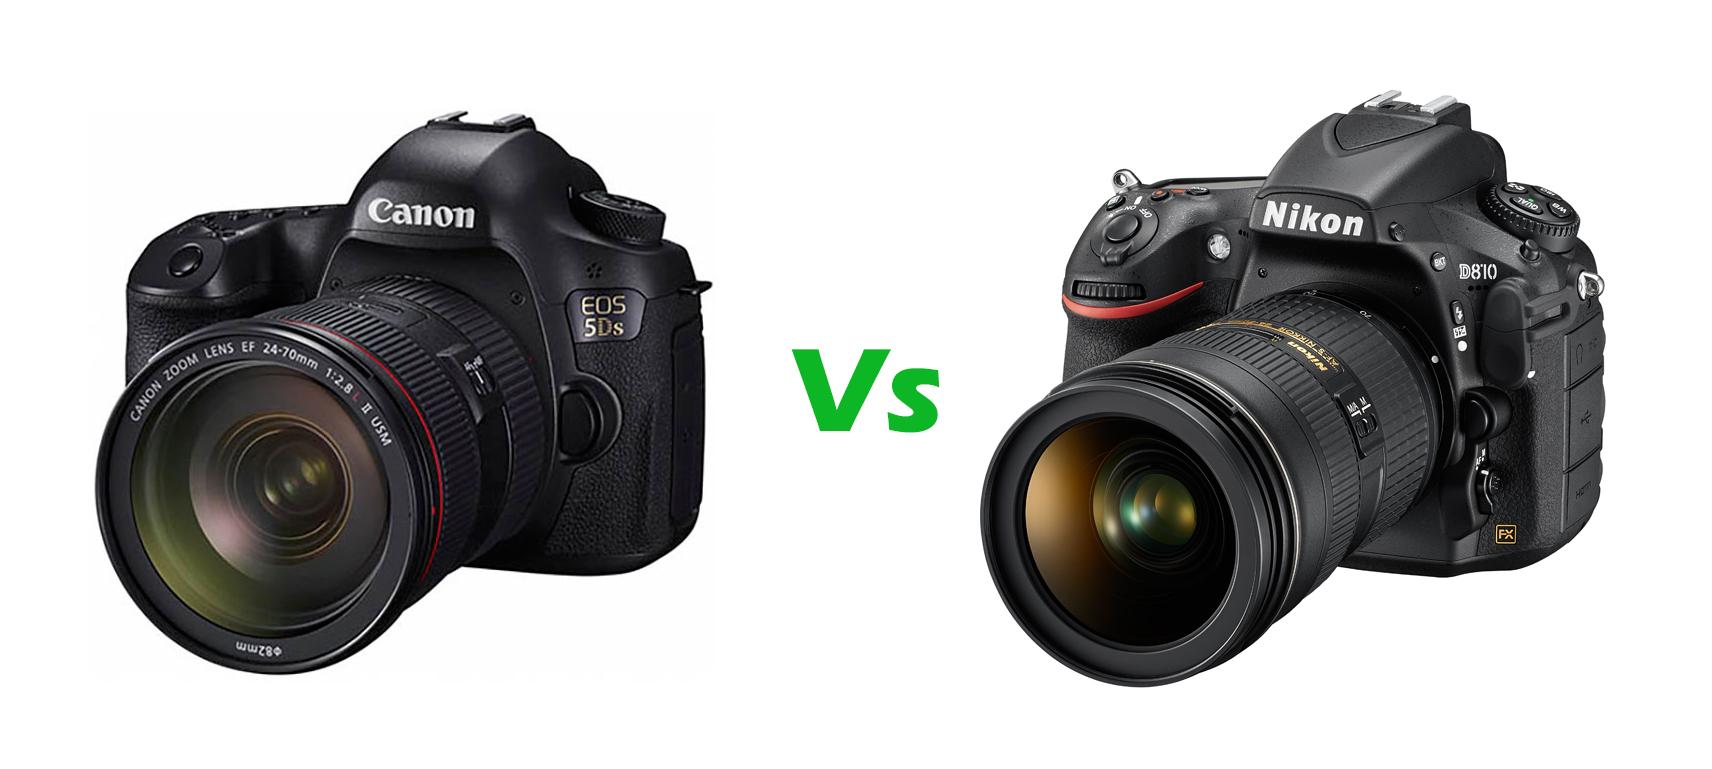 Canon EOS 5Ds Vs Nikon D810